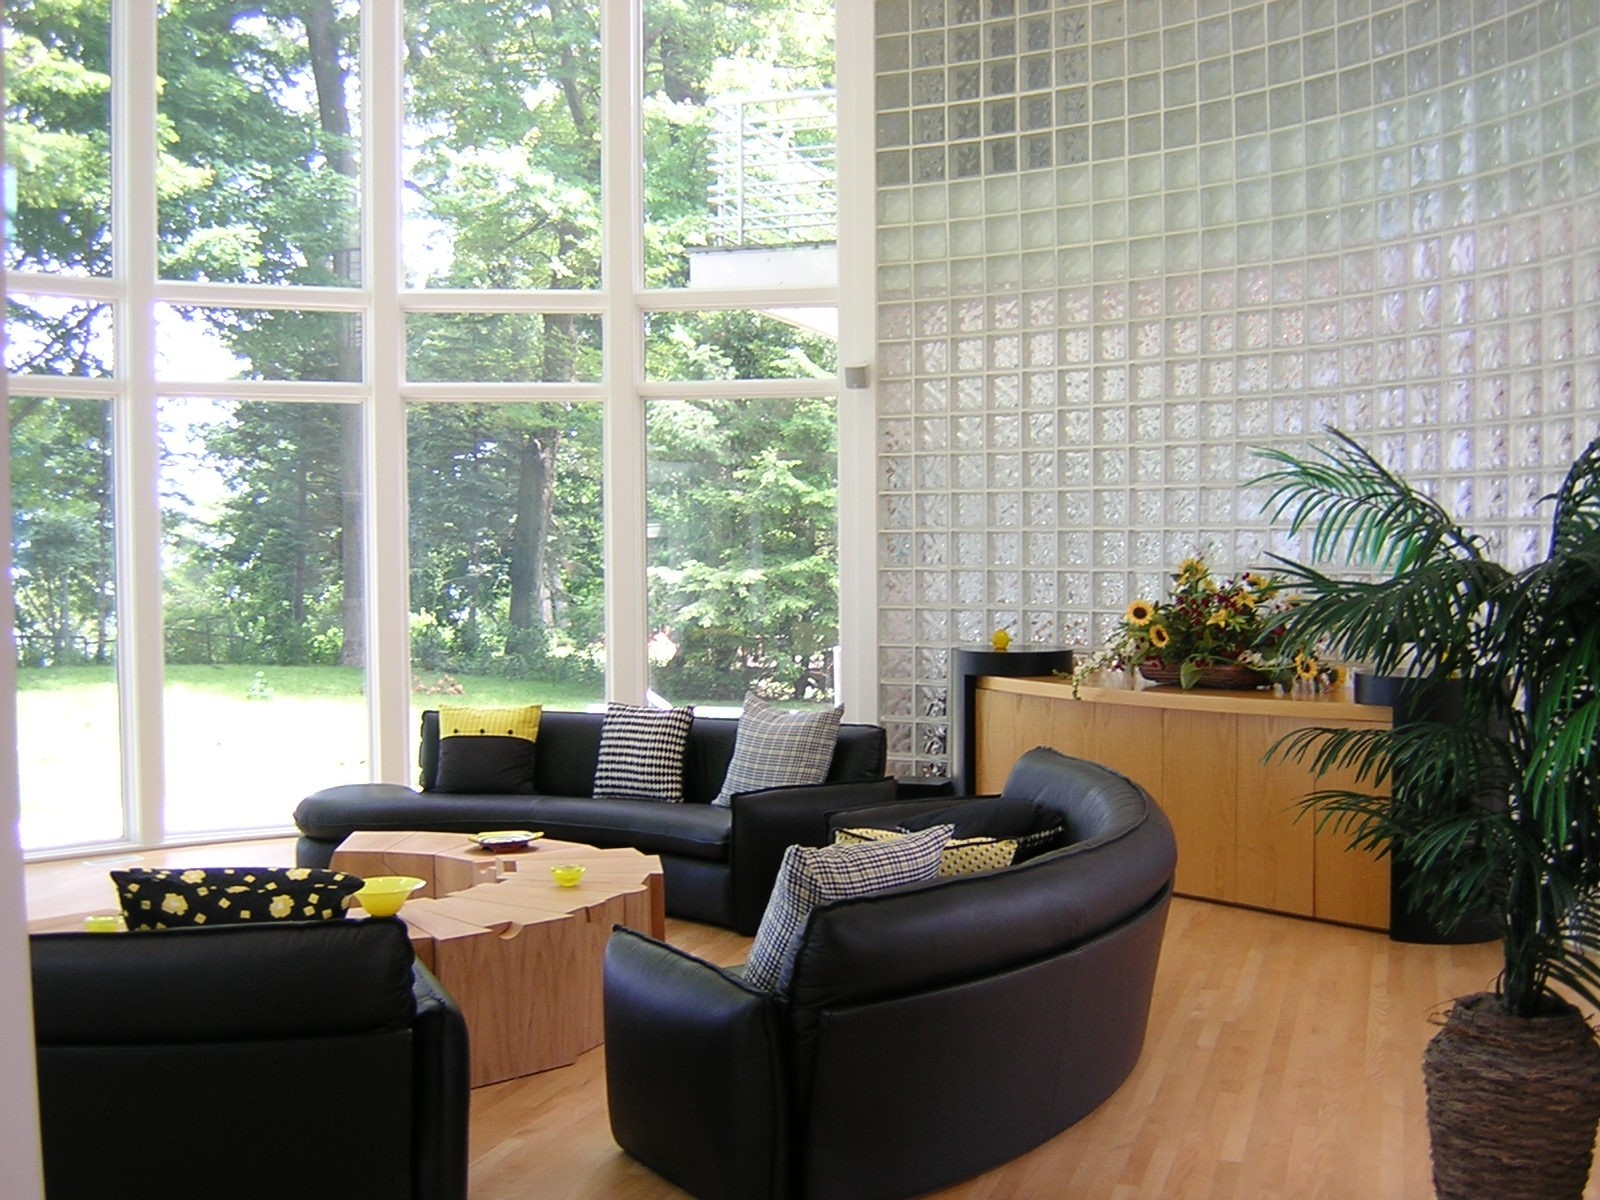 Real Estate Photography - 15930 Lake Ave, Union Pier, MI, 49129 - Location 3